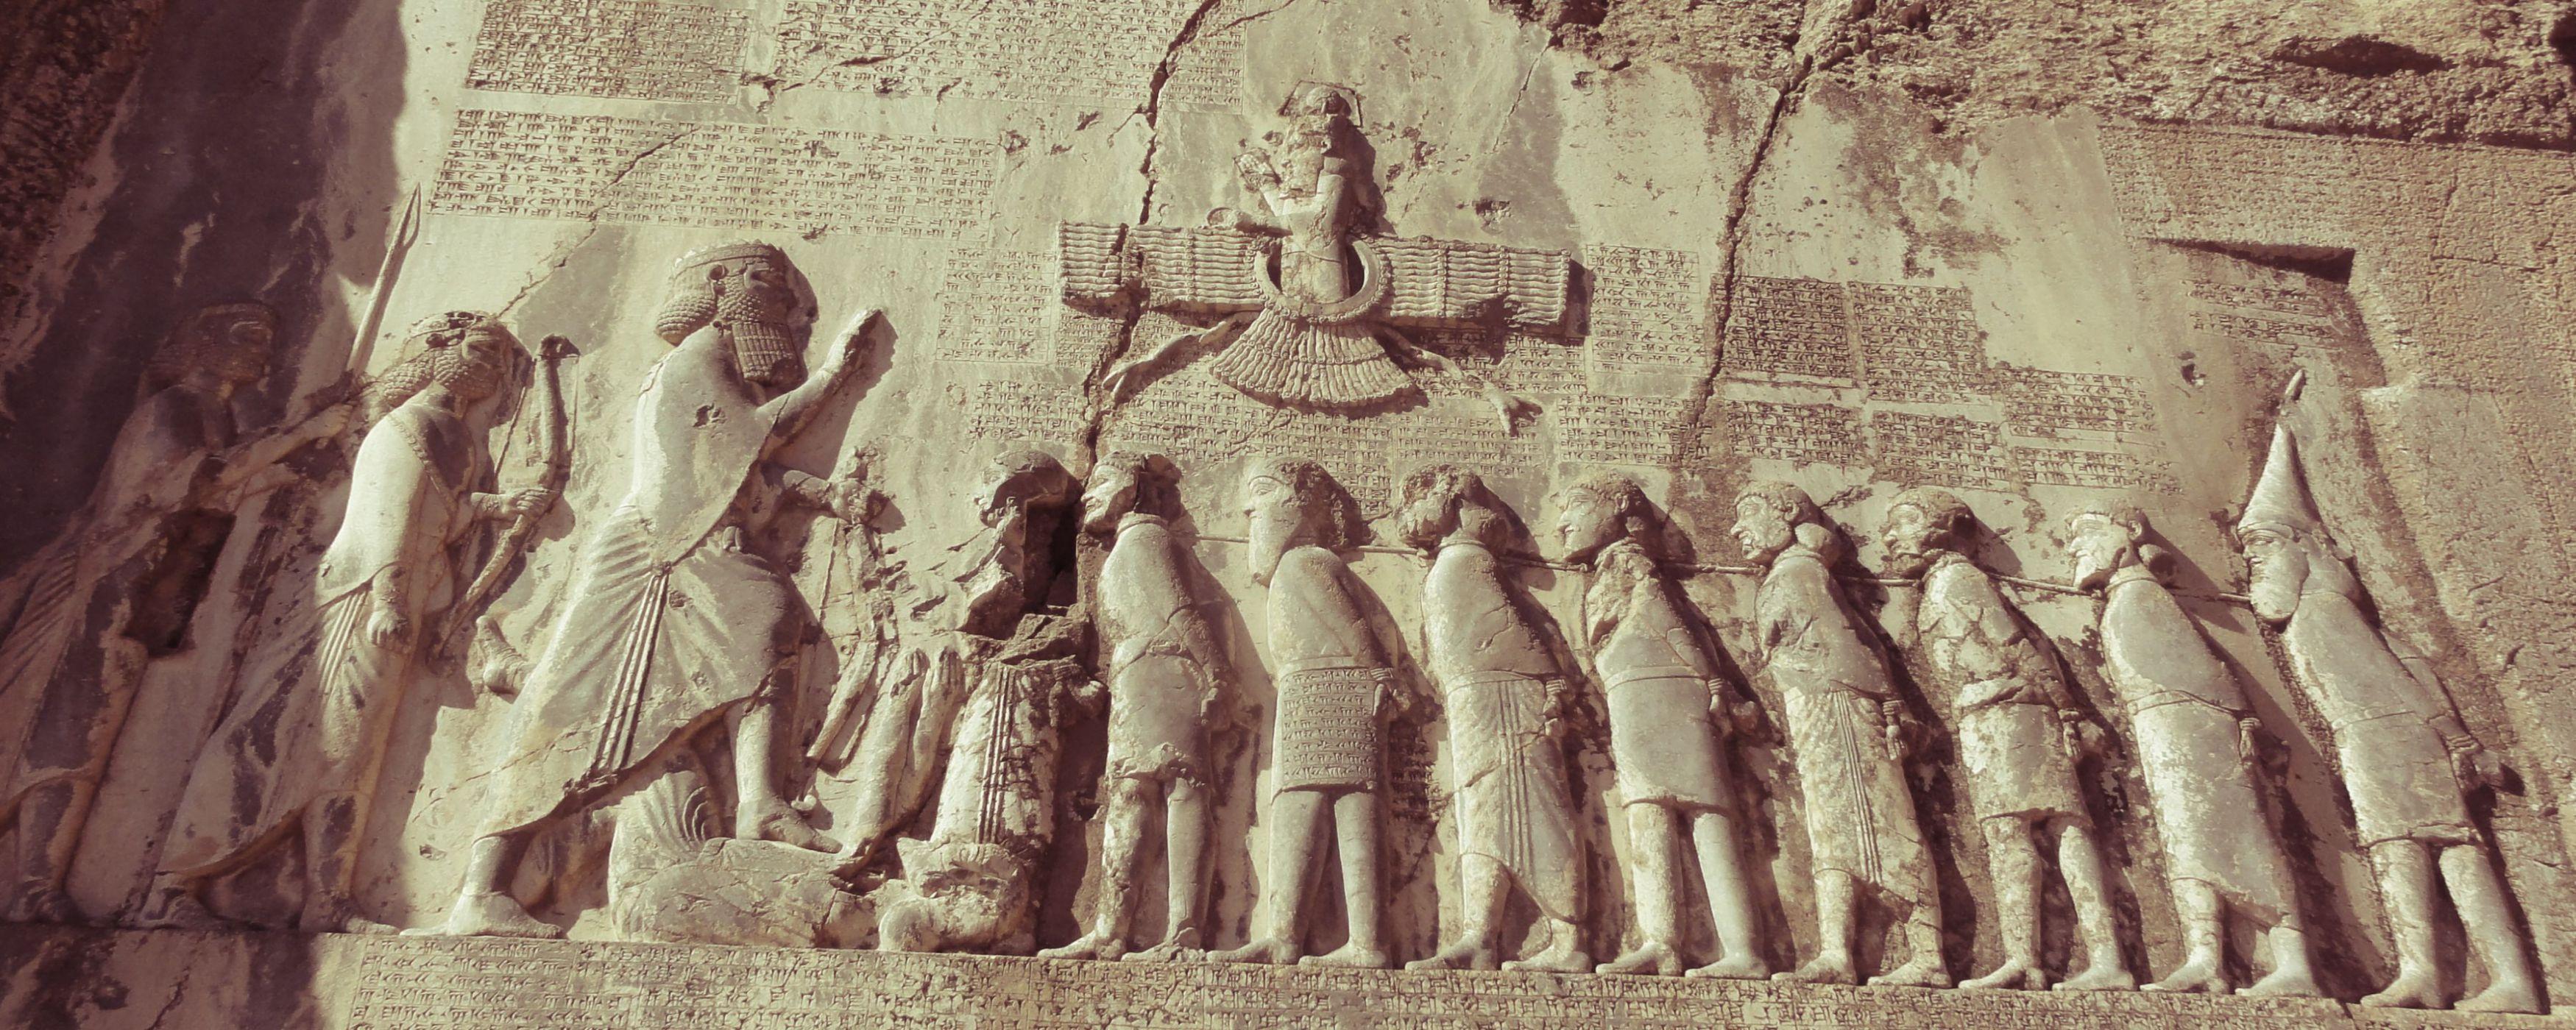 bisotun Iran World Heritage Sites Uncategorized Iran World Heritage Sites Iran Culture